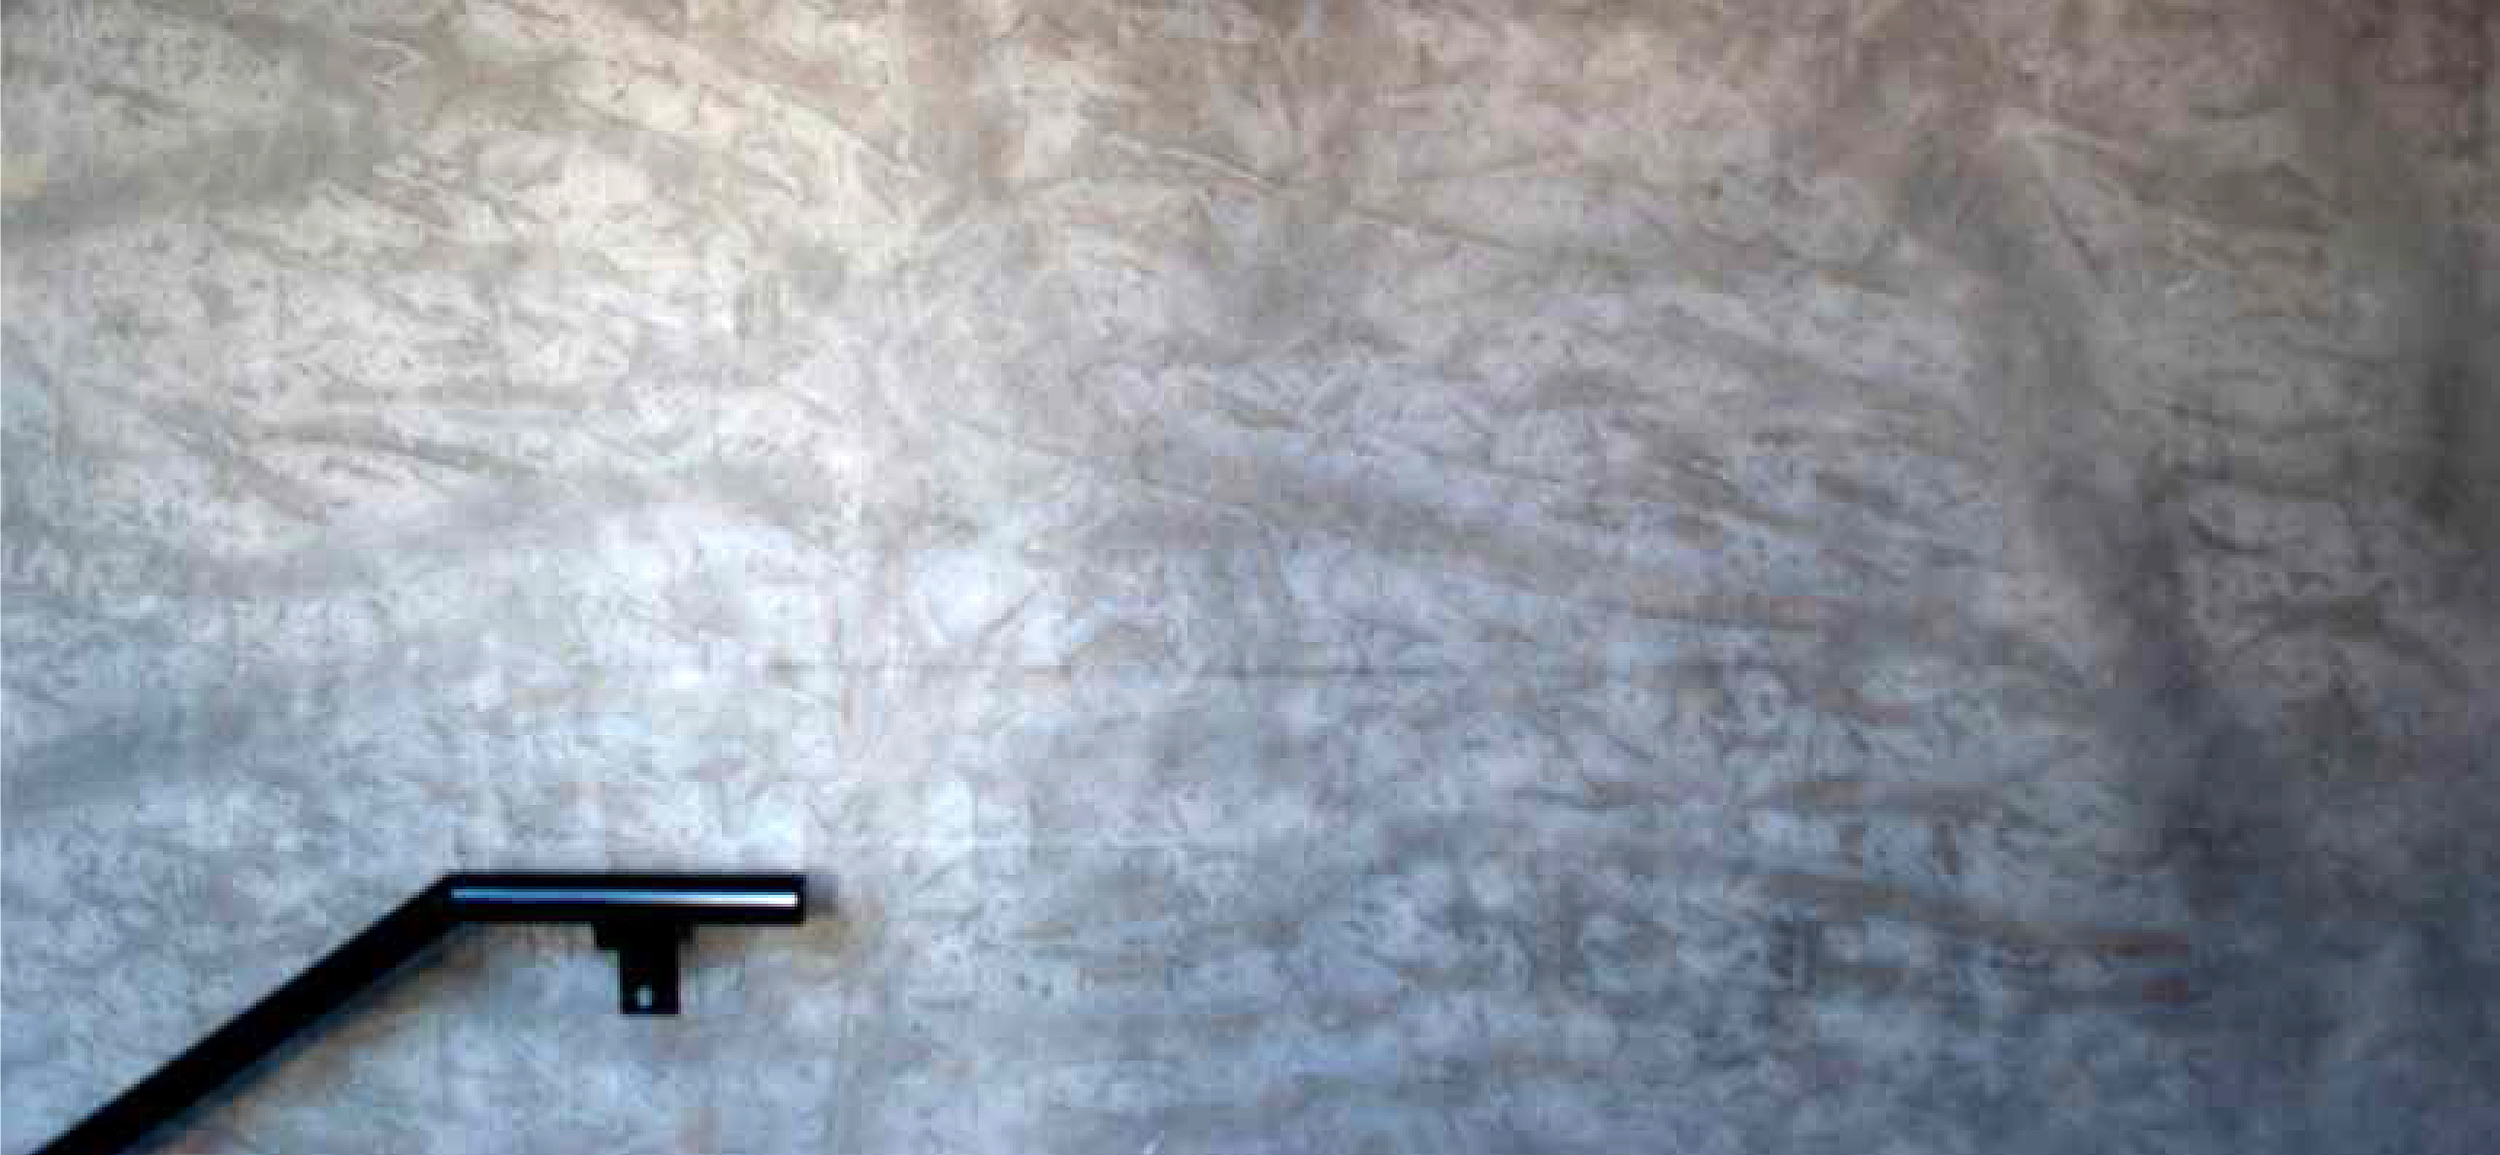 BLDG_york2_handrail.jpg